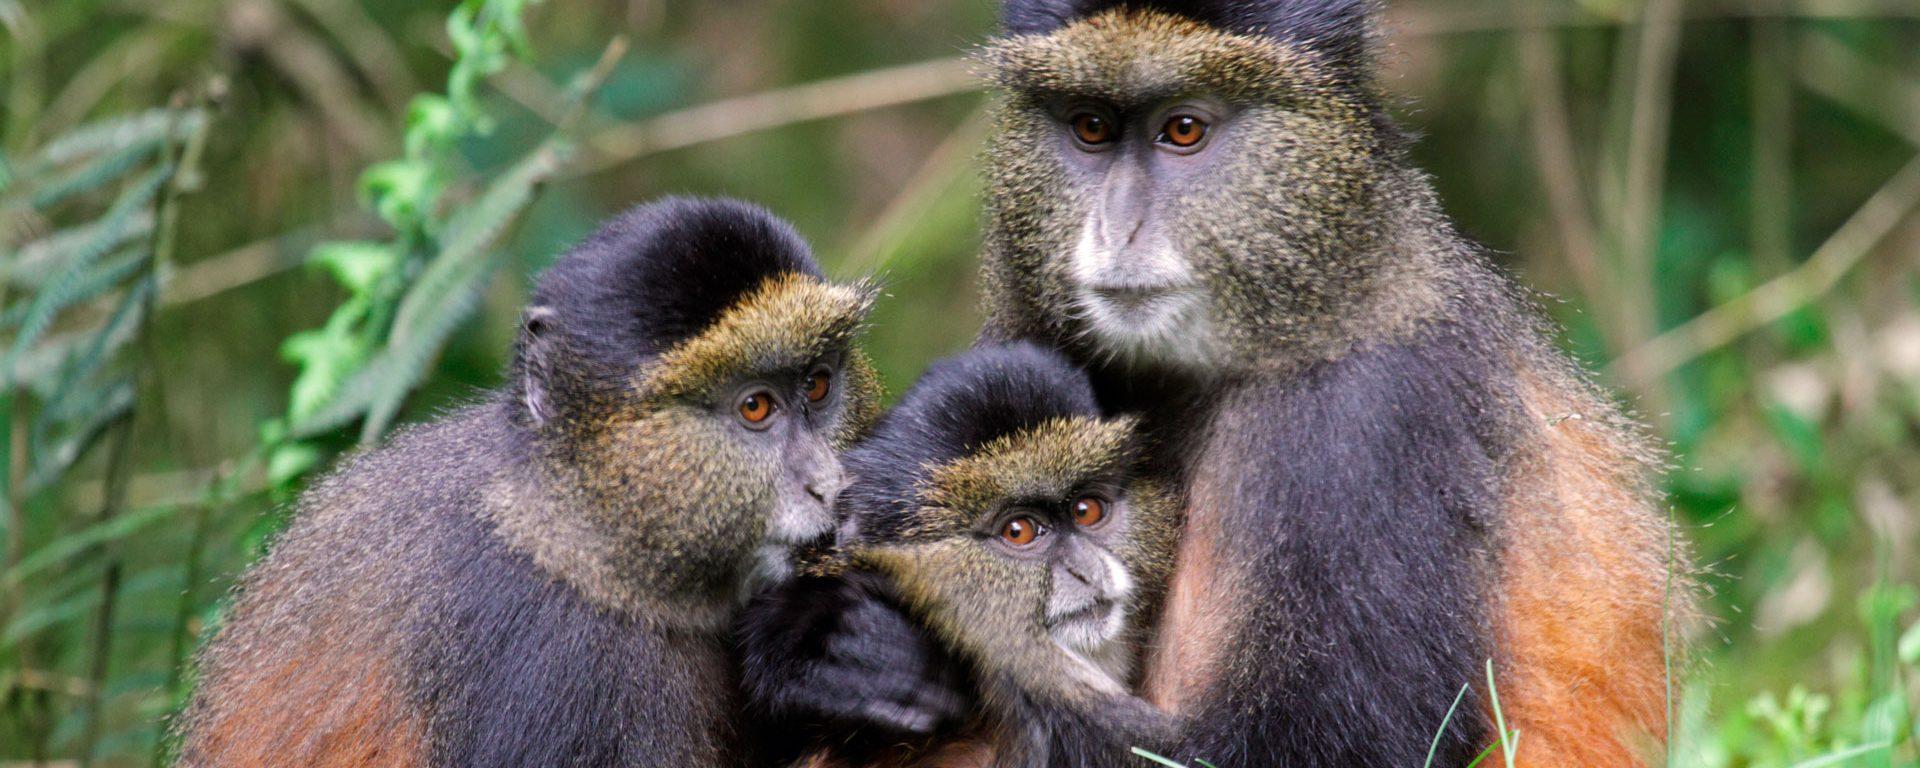 Golden monkey family in a bamboo forest in Volcanoes National Park, Rwanda